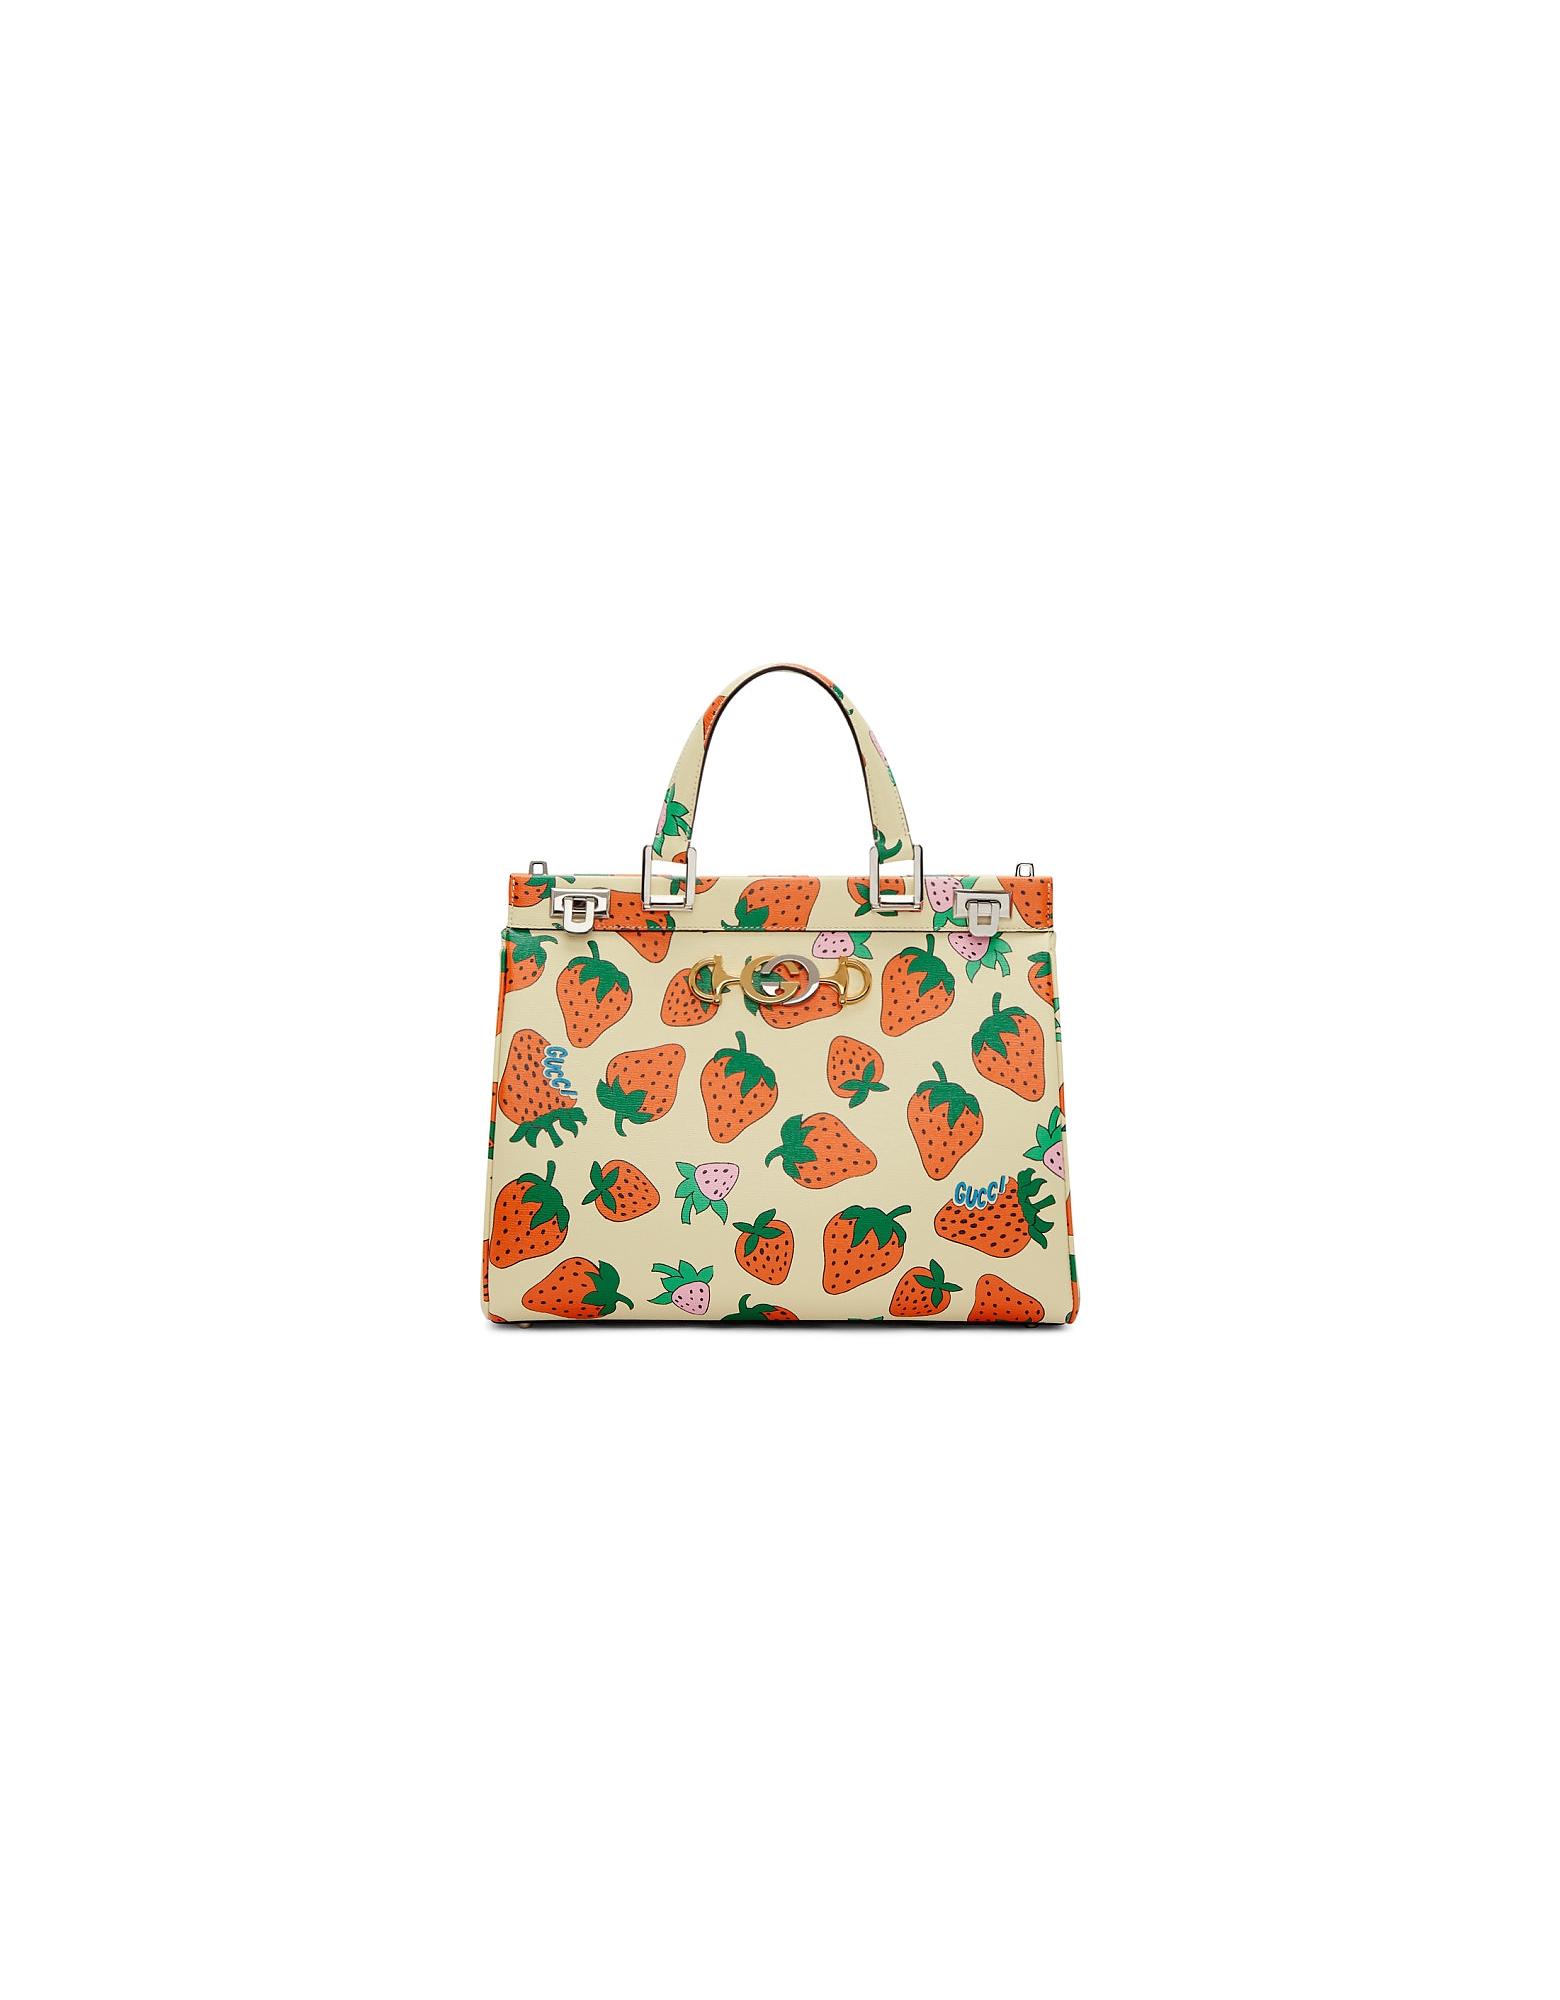 Gucci Designer Handbags, Off-White Medium Zumi Strawberry Top Handle Bag